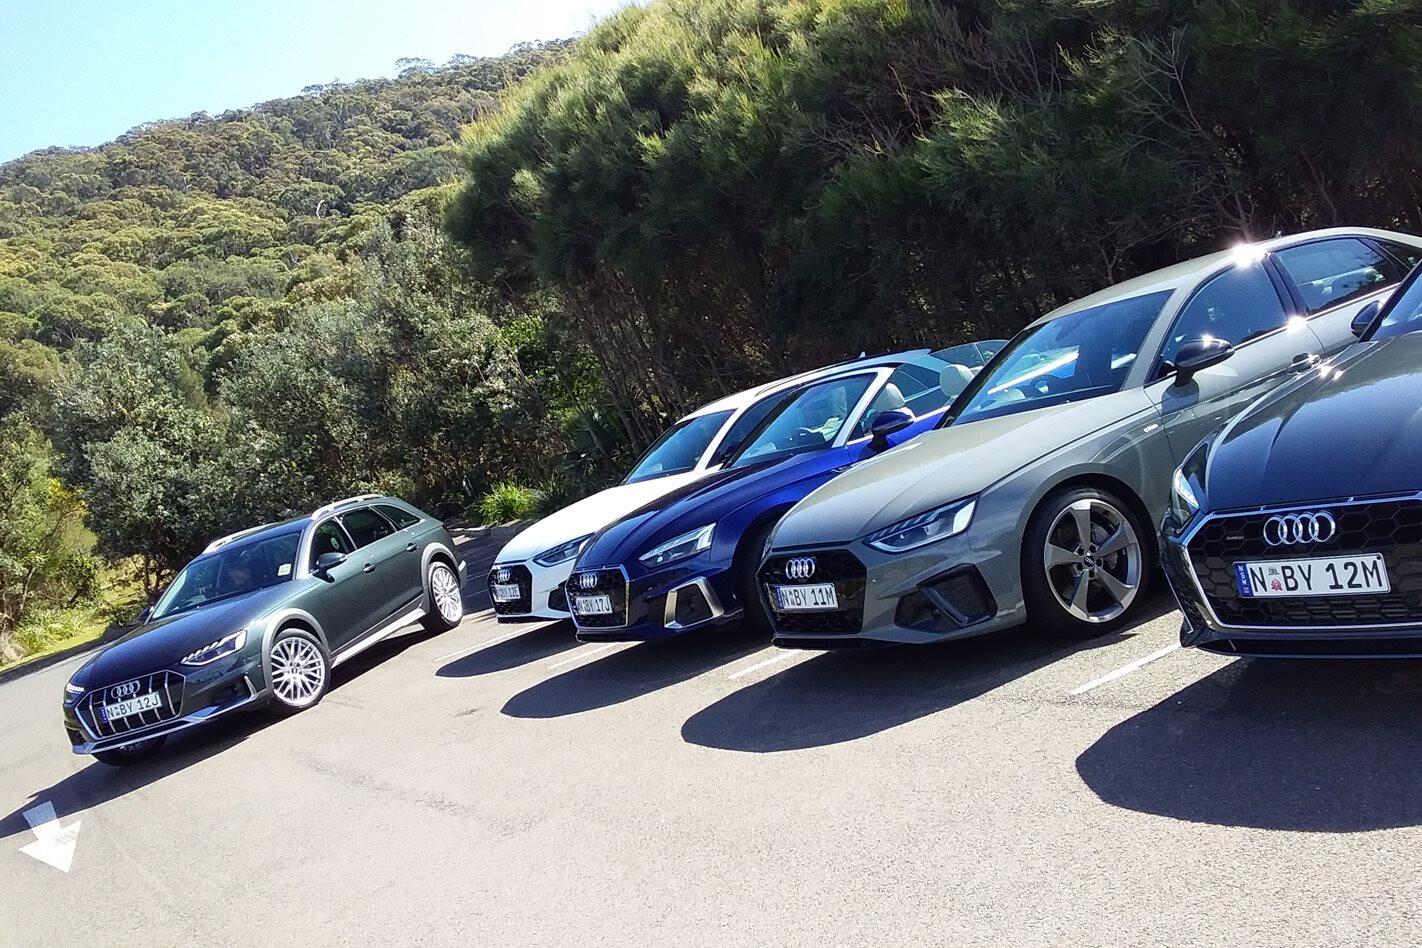 2020 Audi A4 and A5 range